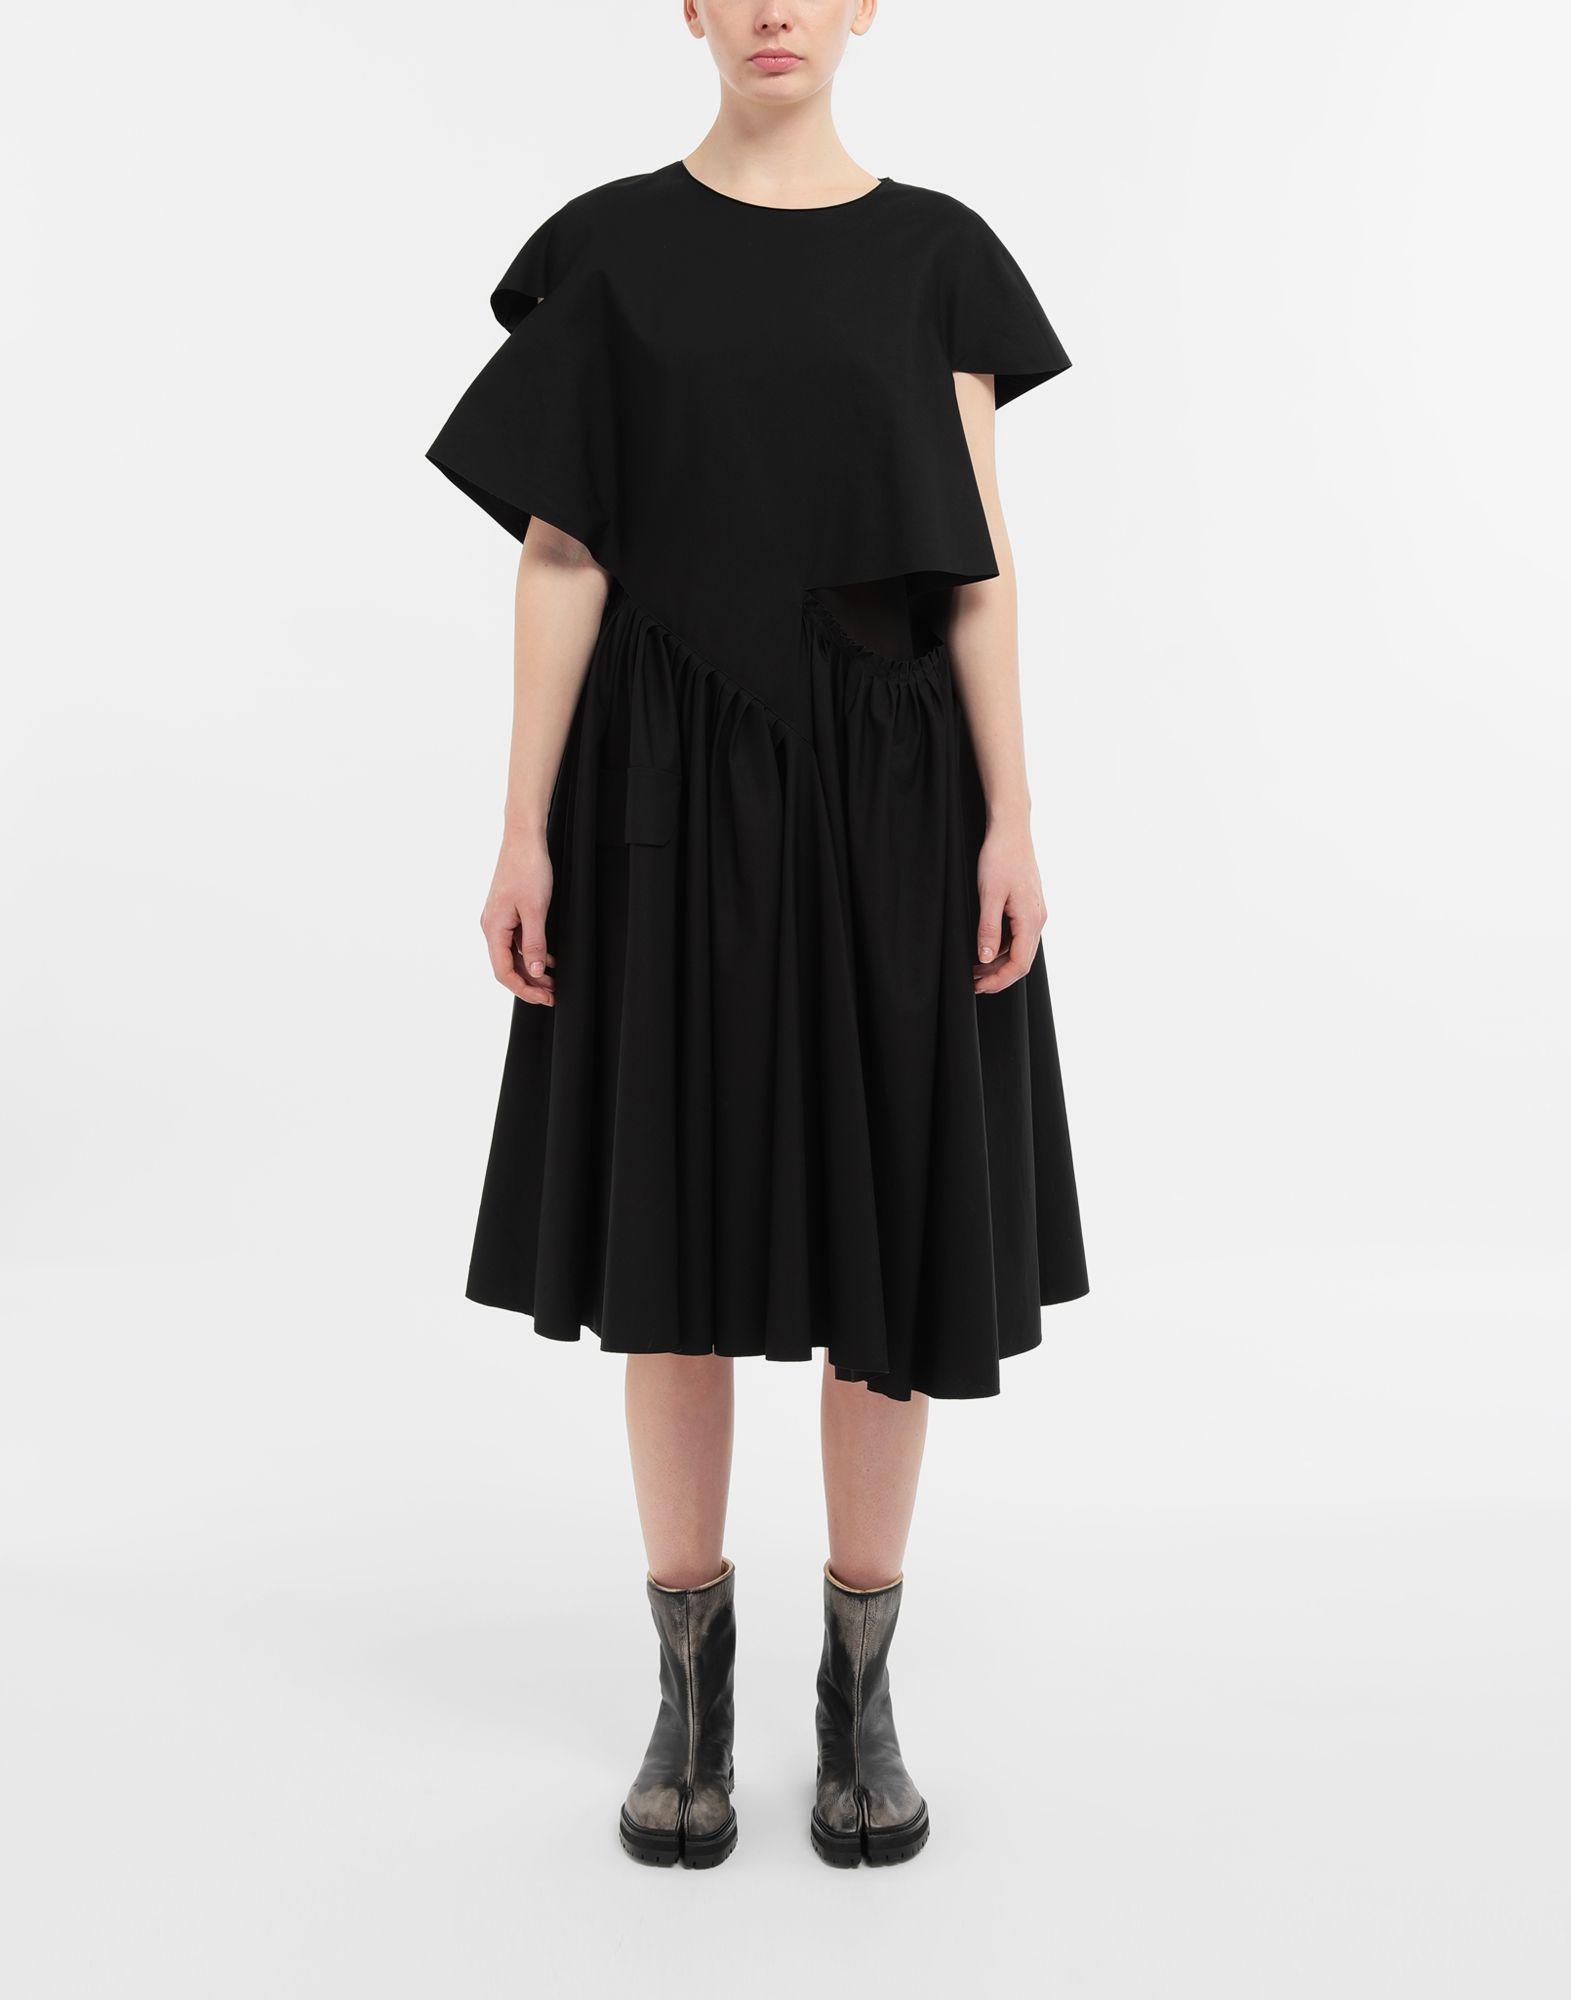 MAISON MARGIELA Décortiqué gathered midi dress 3/4 length dress Woman r